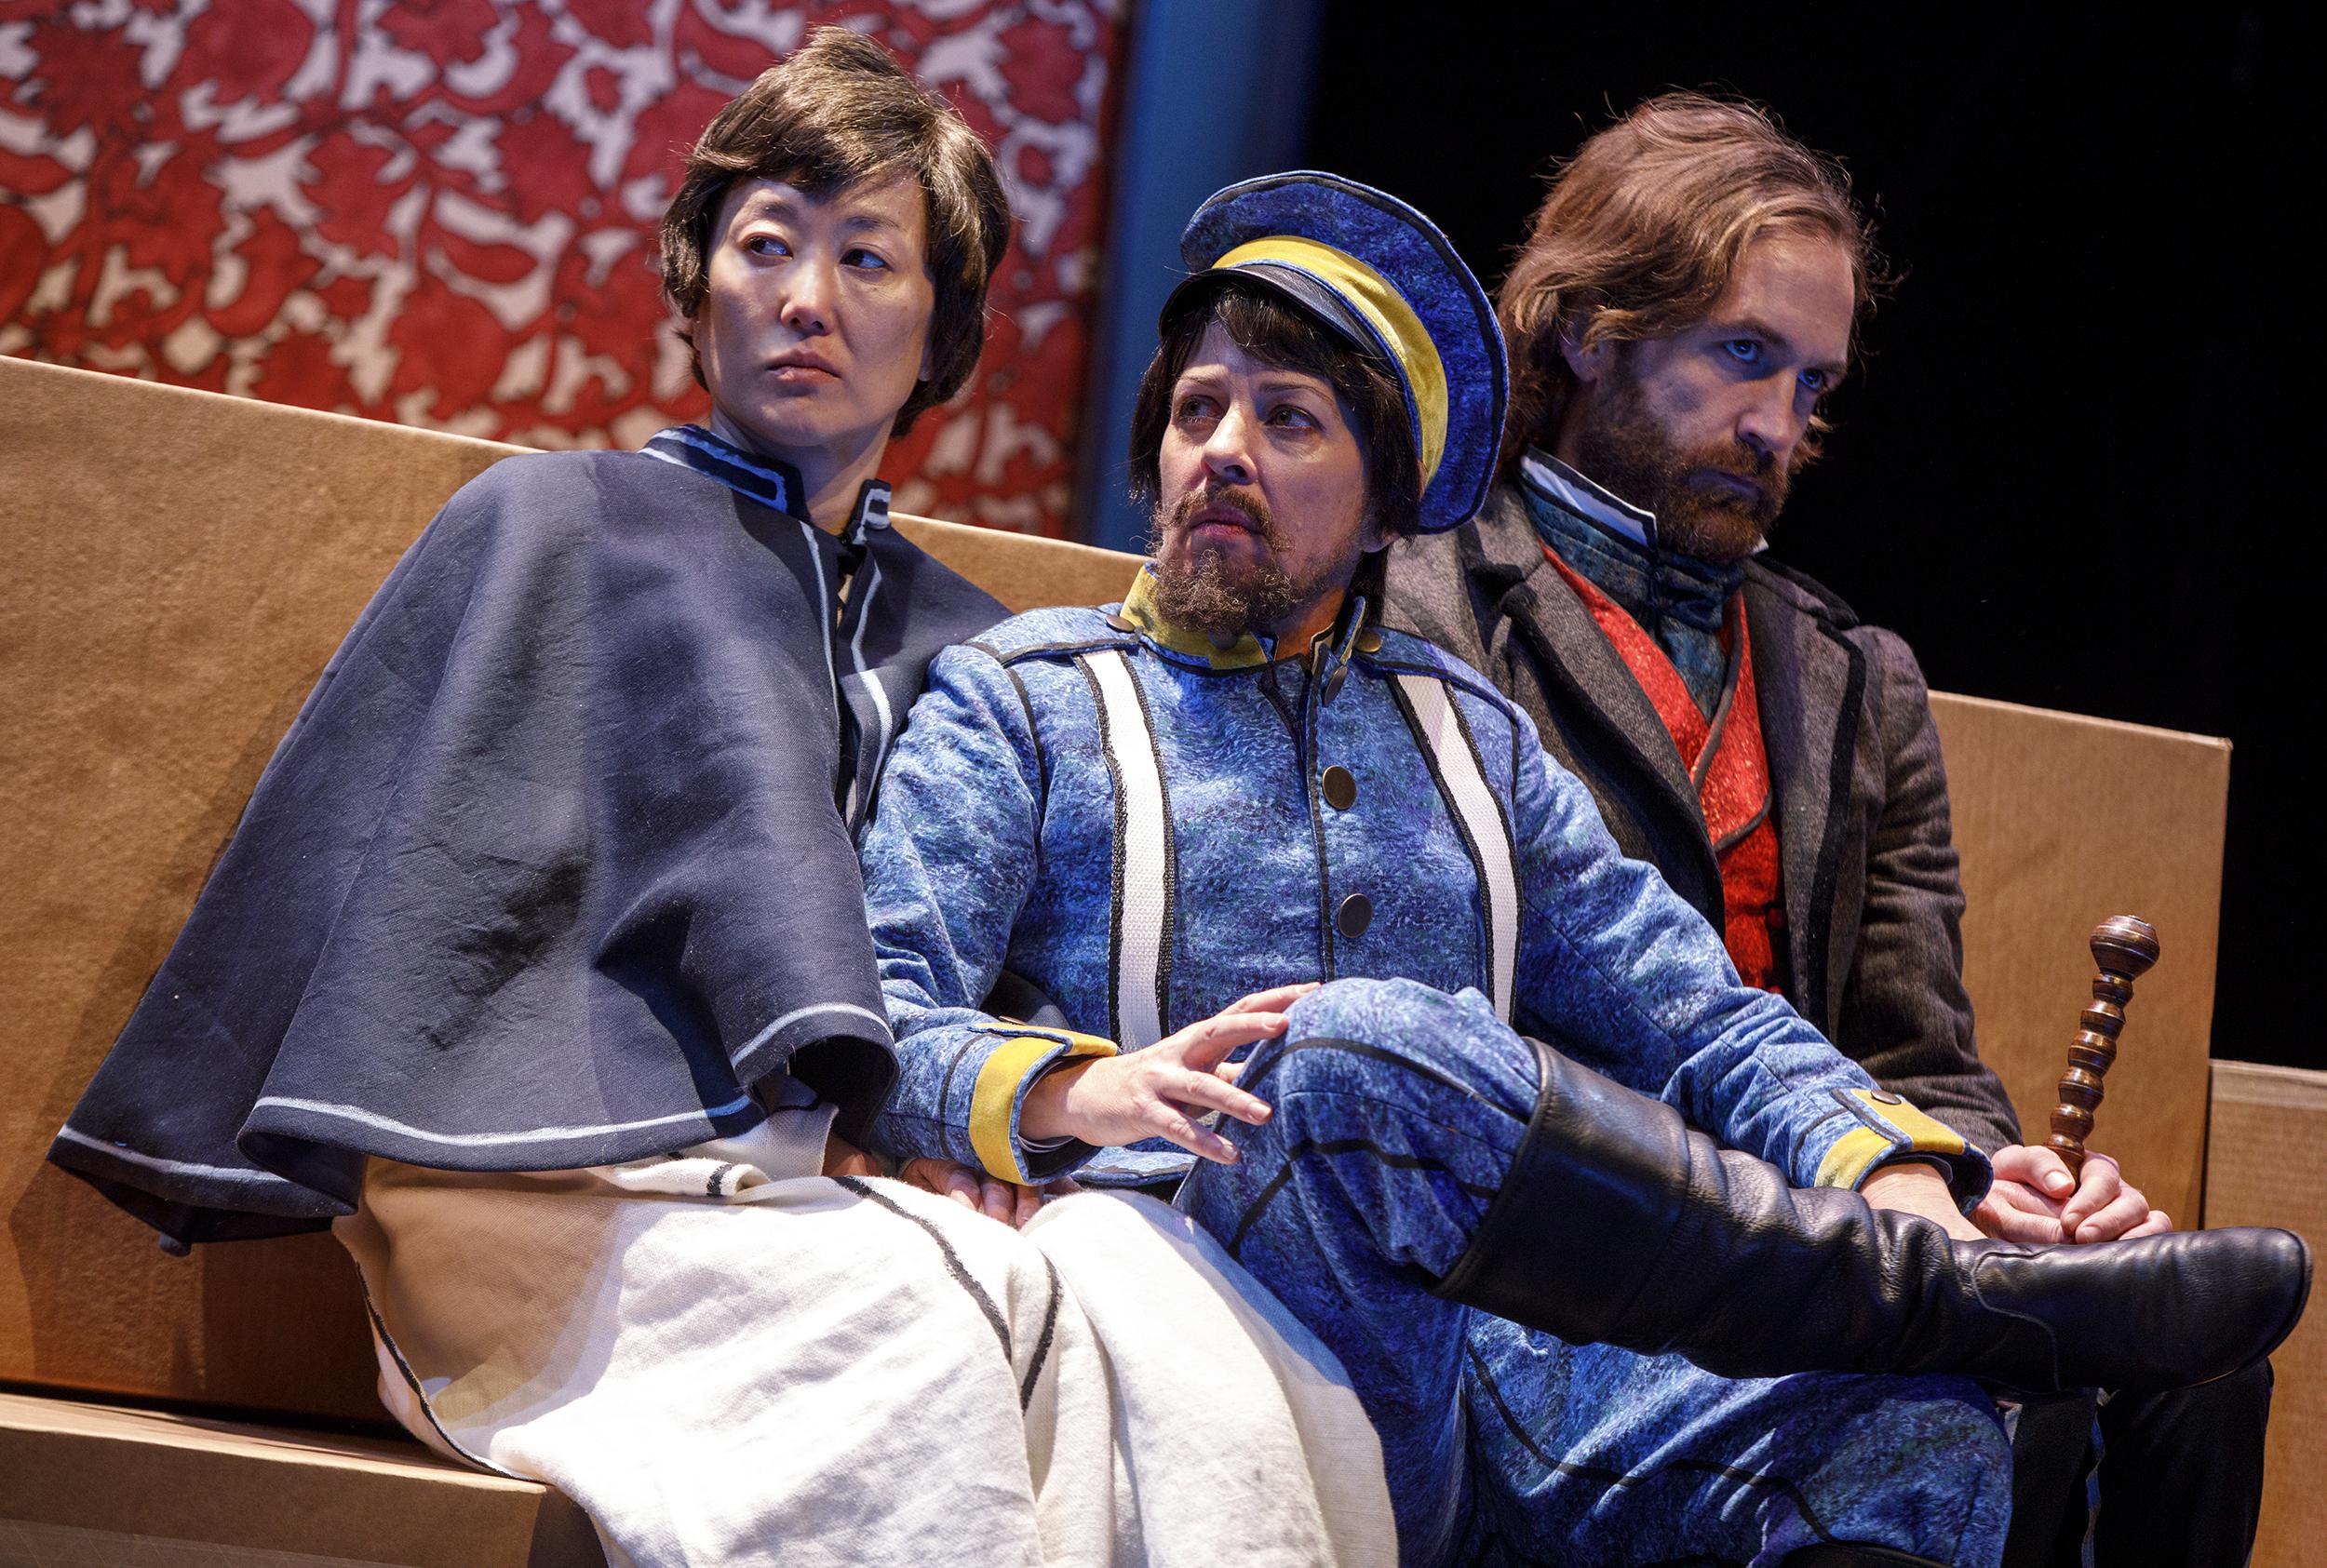 Alyosha (Mari Akita), Dmitri (Lana Lesley), Ivan (Thomas Graves) (photos by Joan Marcus)